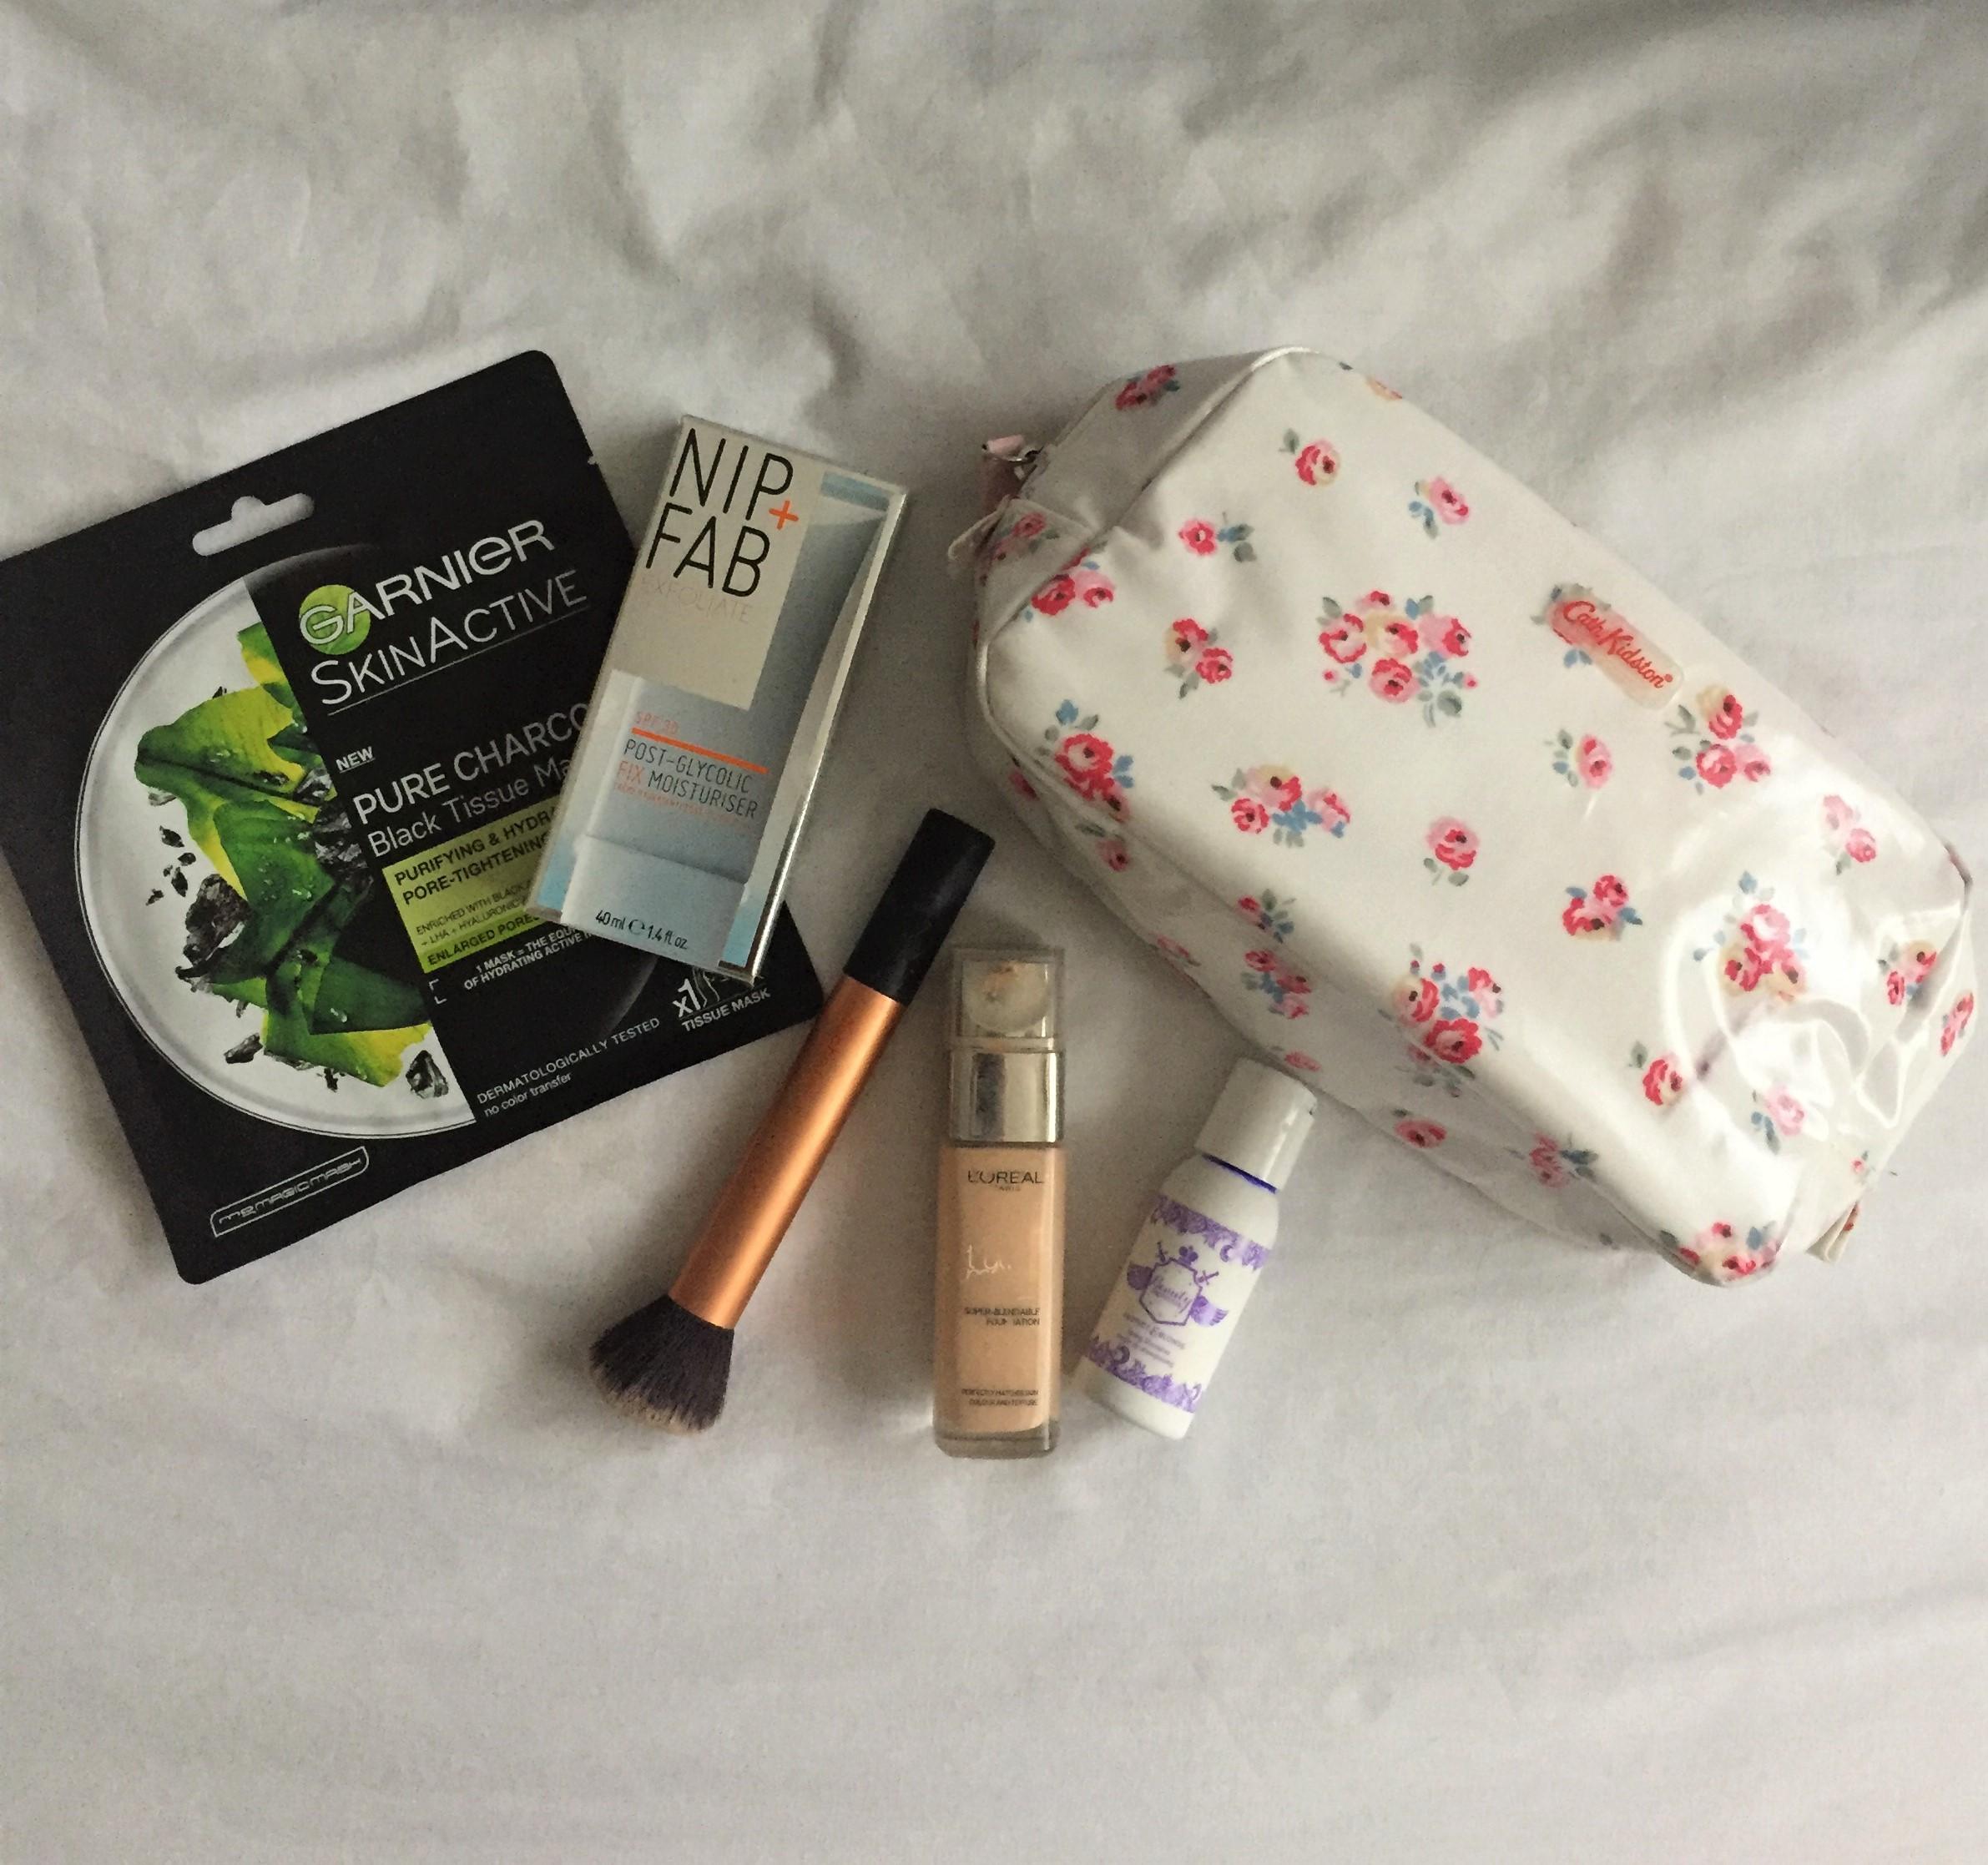 25 Beauty Blog Post Ideas